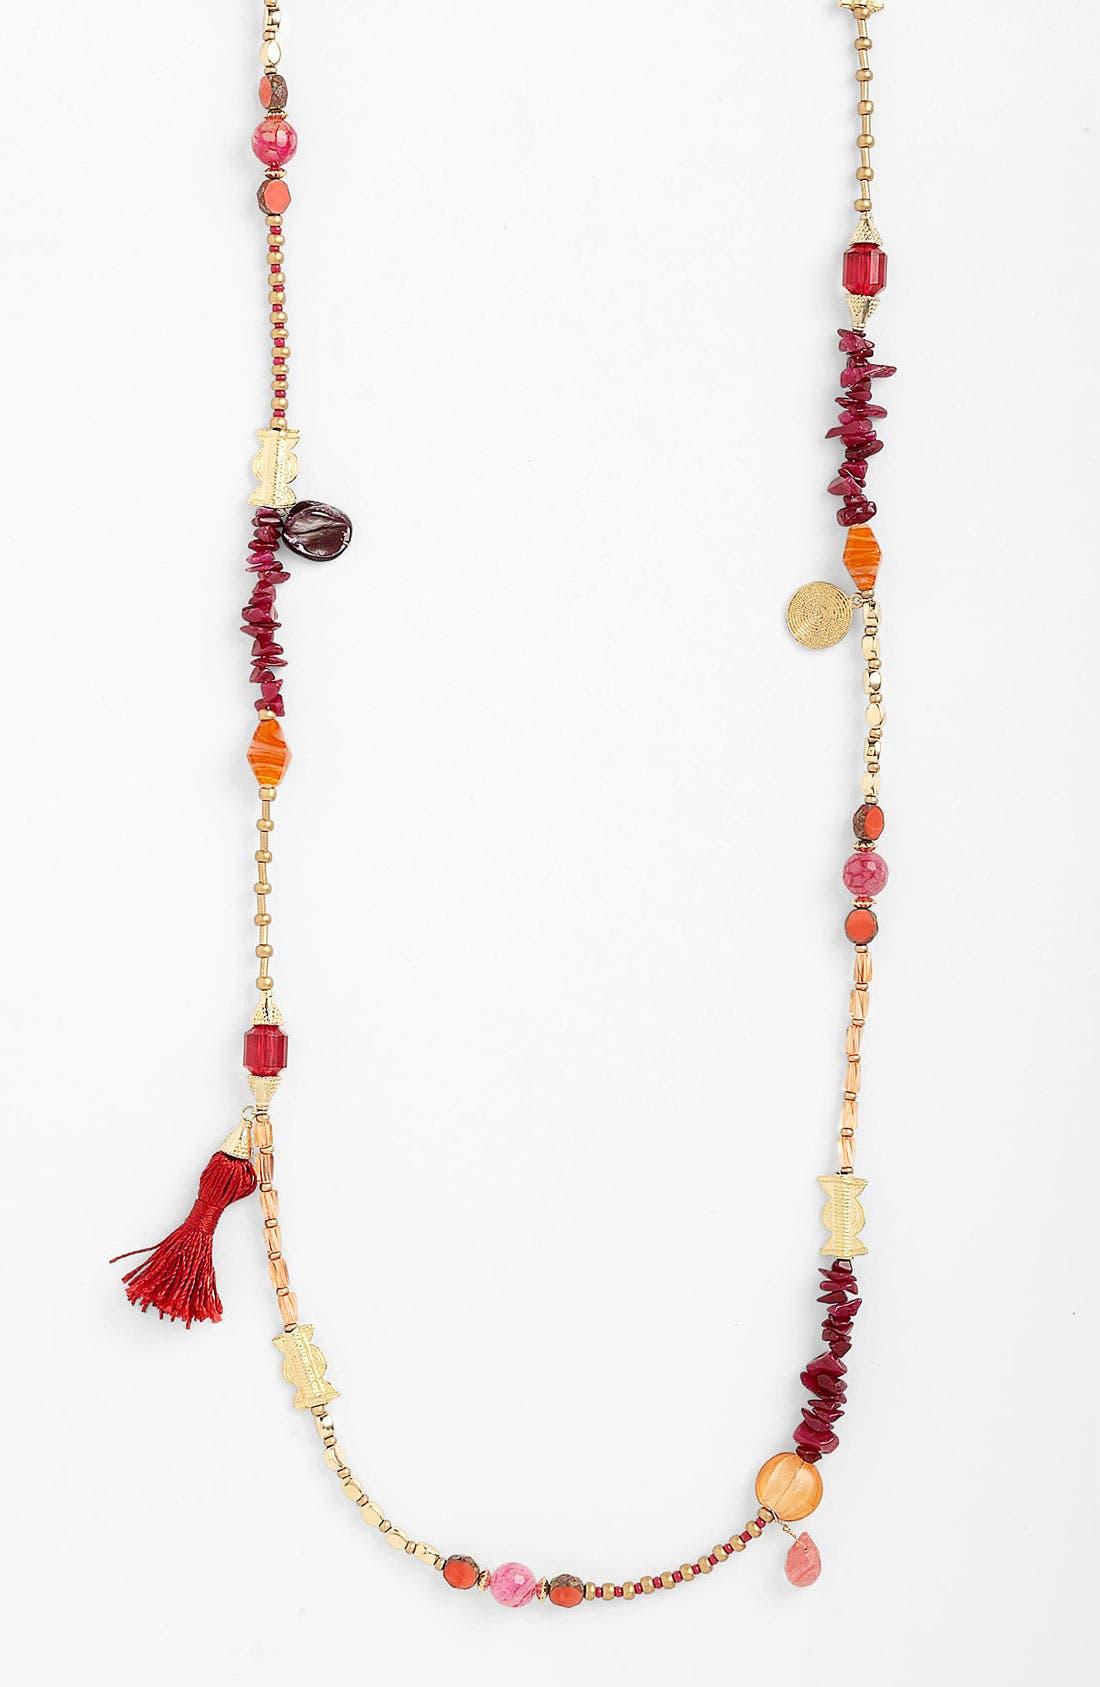 Main Image - Sara Bella Extra Long Beaded Necklace